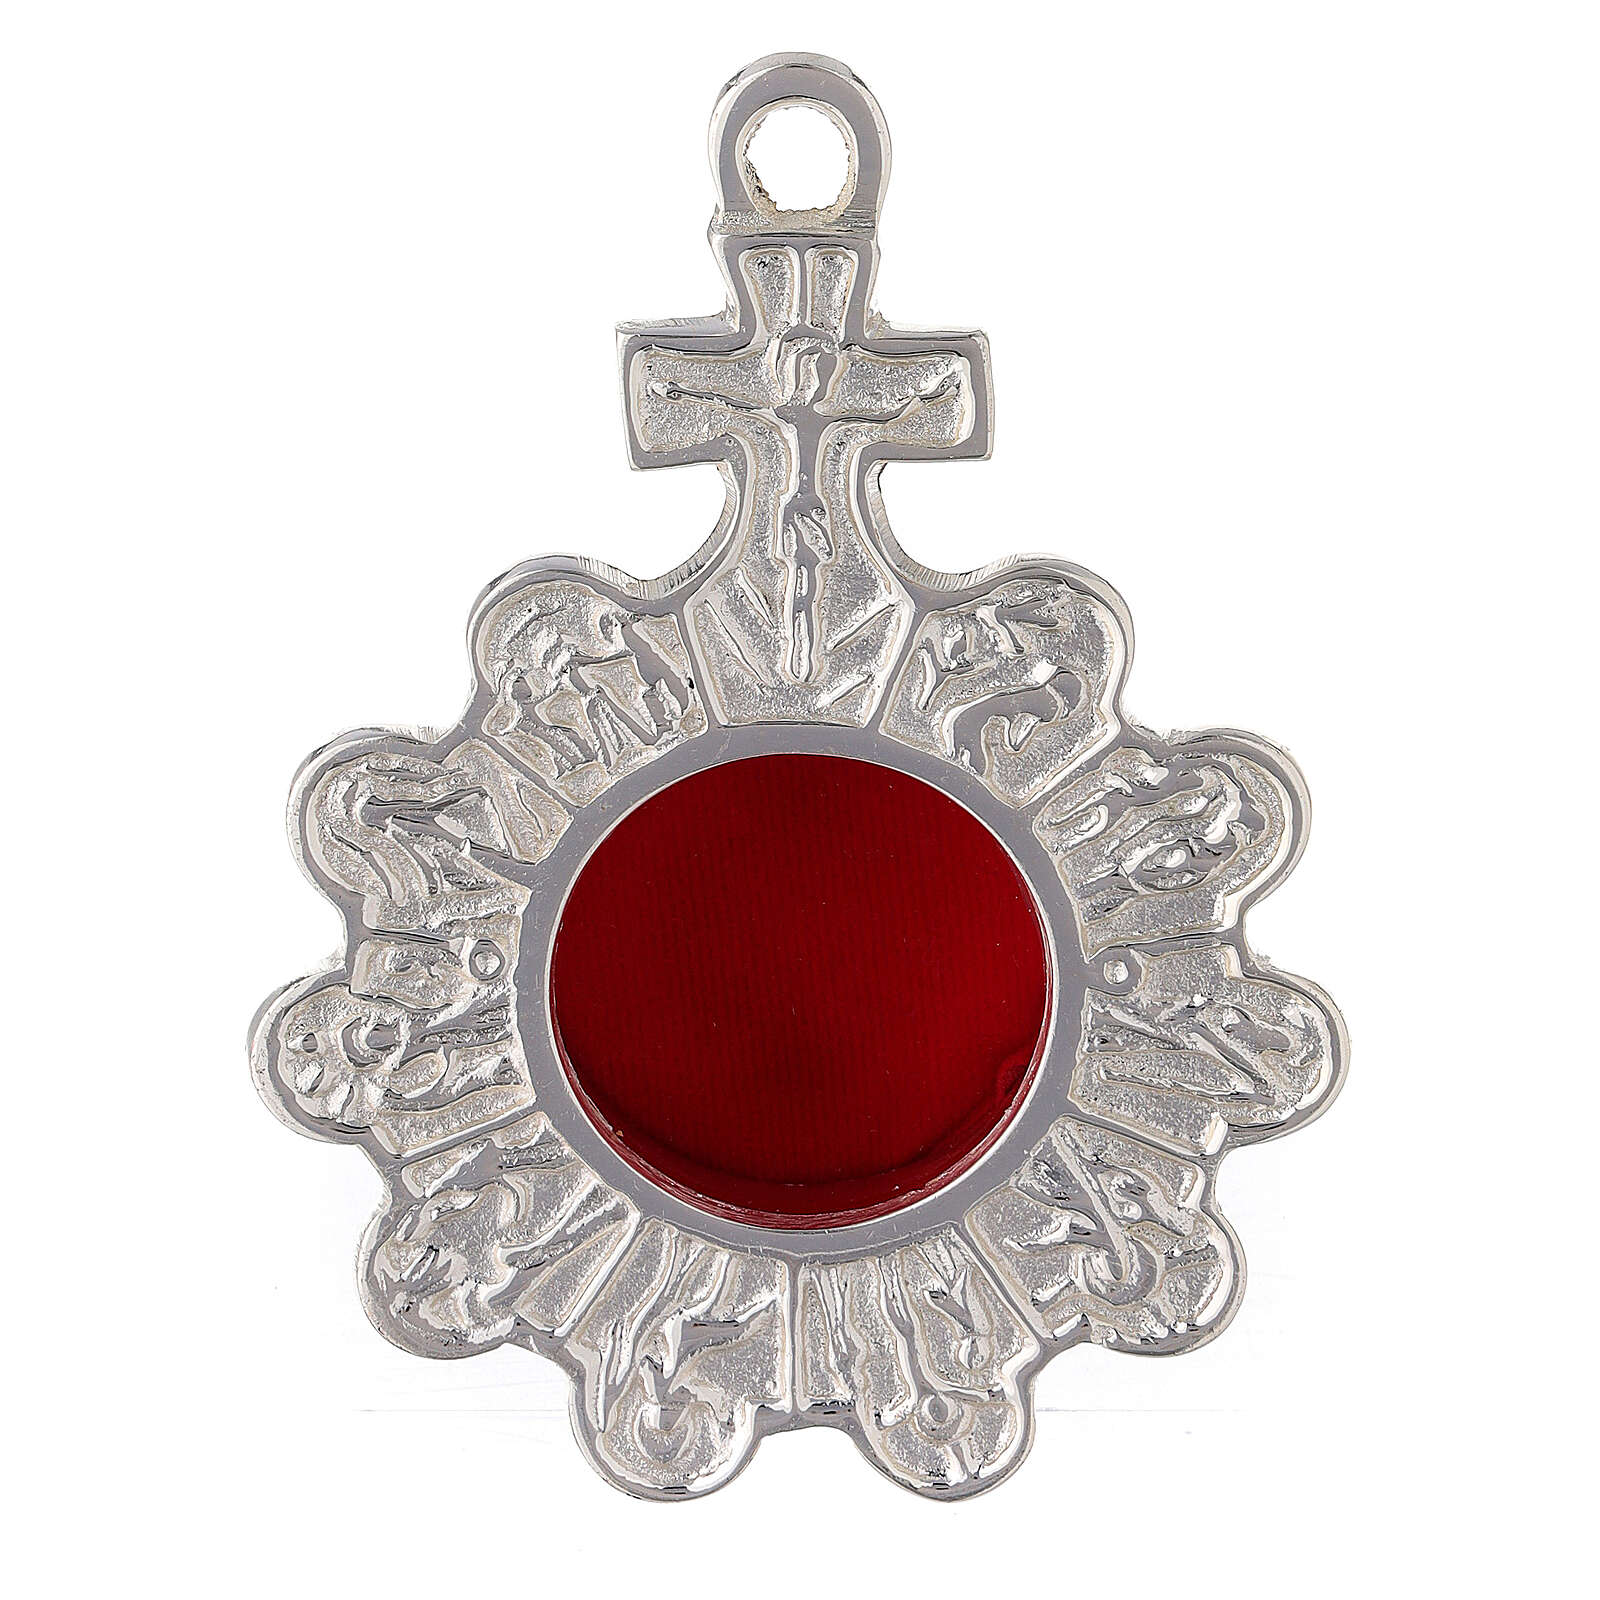 Relicario rosario de pared latón plateado 4